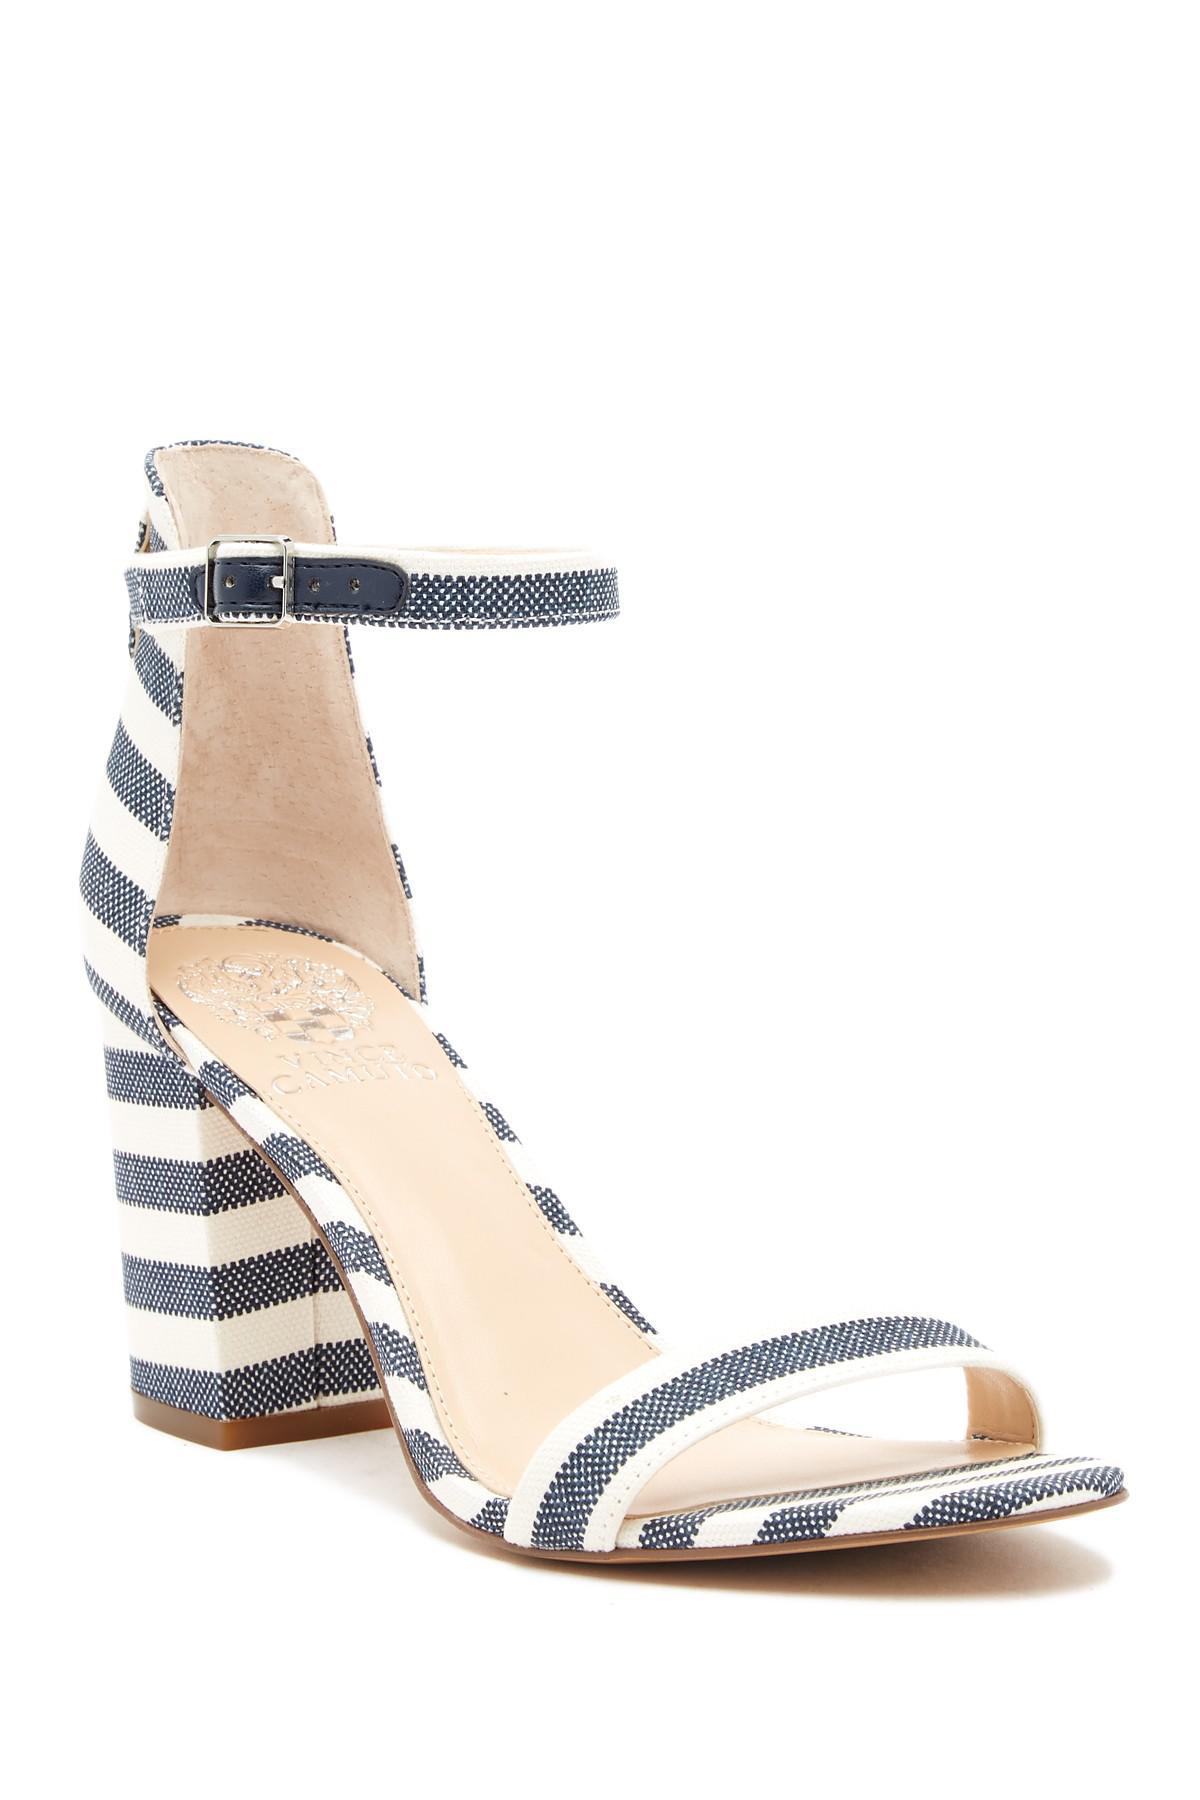 7b47c11e151 Vince Camuto Beah Block Heel Ankle Strap Sandal in Blue - Lyst